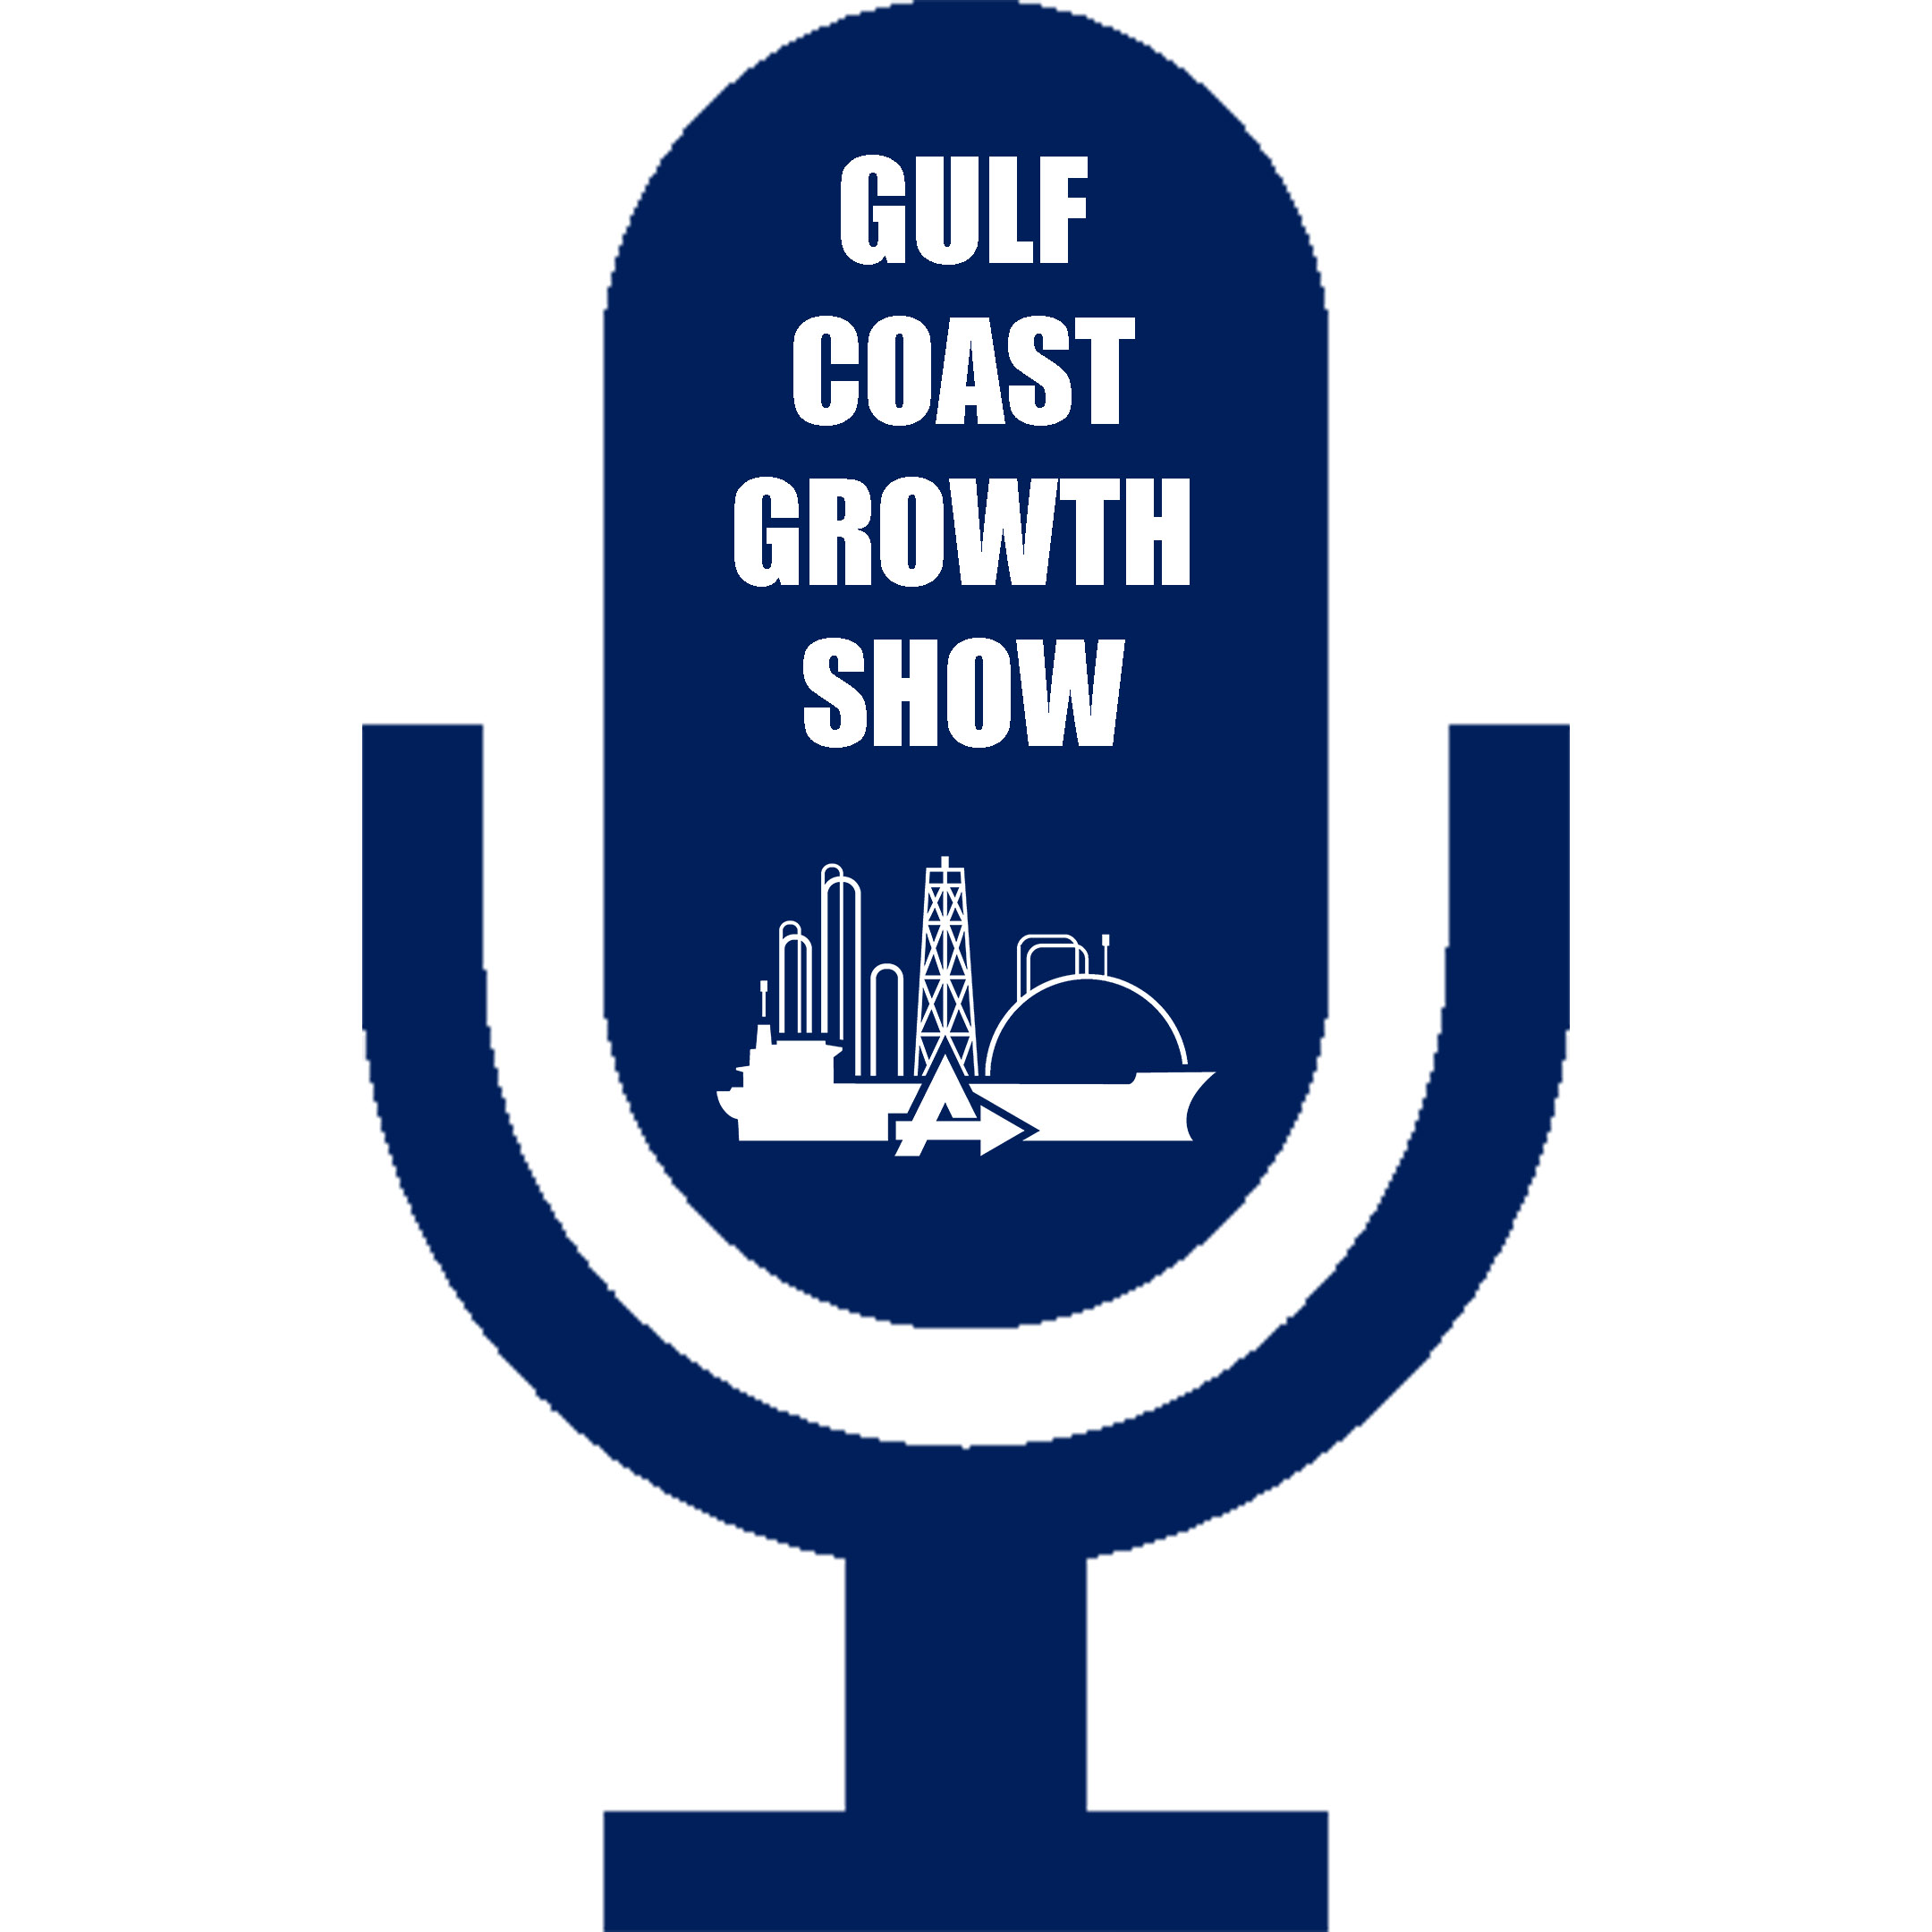 The Gulf Coast Growth Show